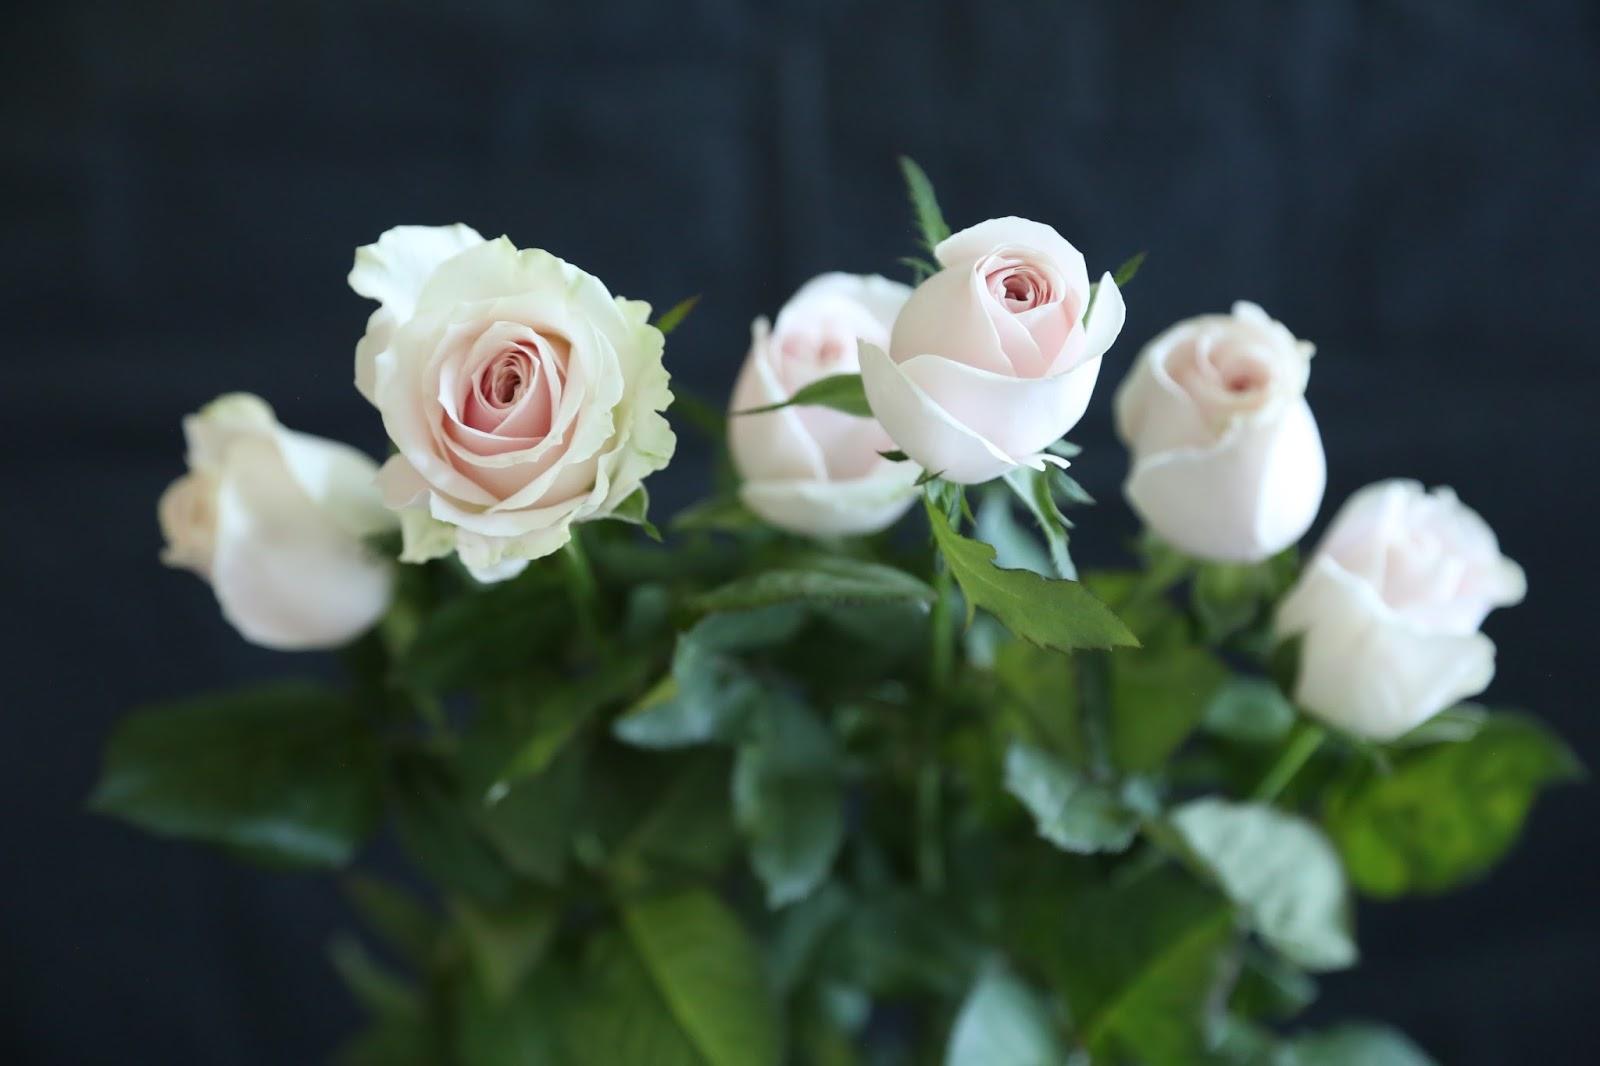 Freshcutfloral Wholesale Fresh Cut Flowers Fillersgreenery And